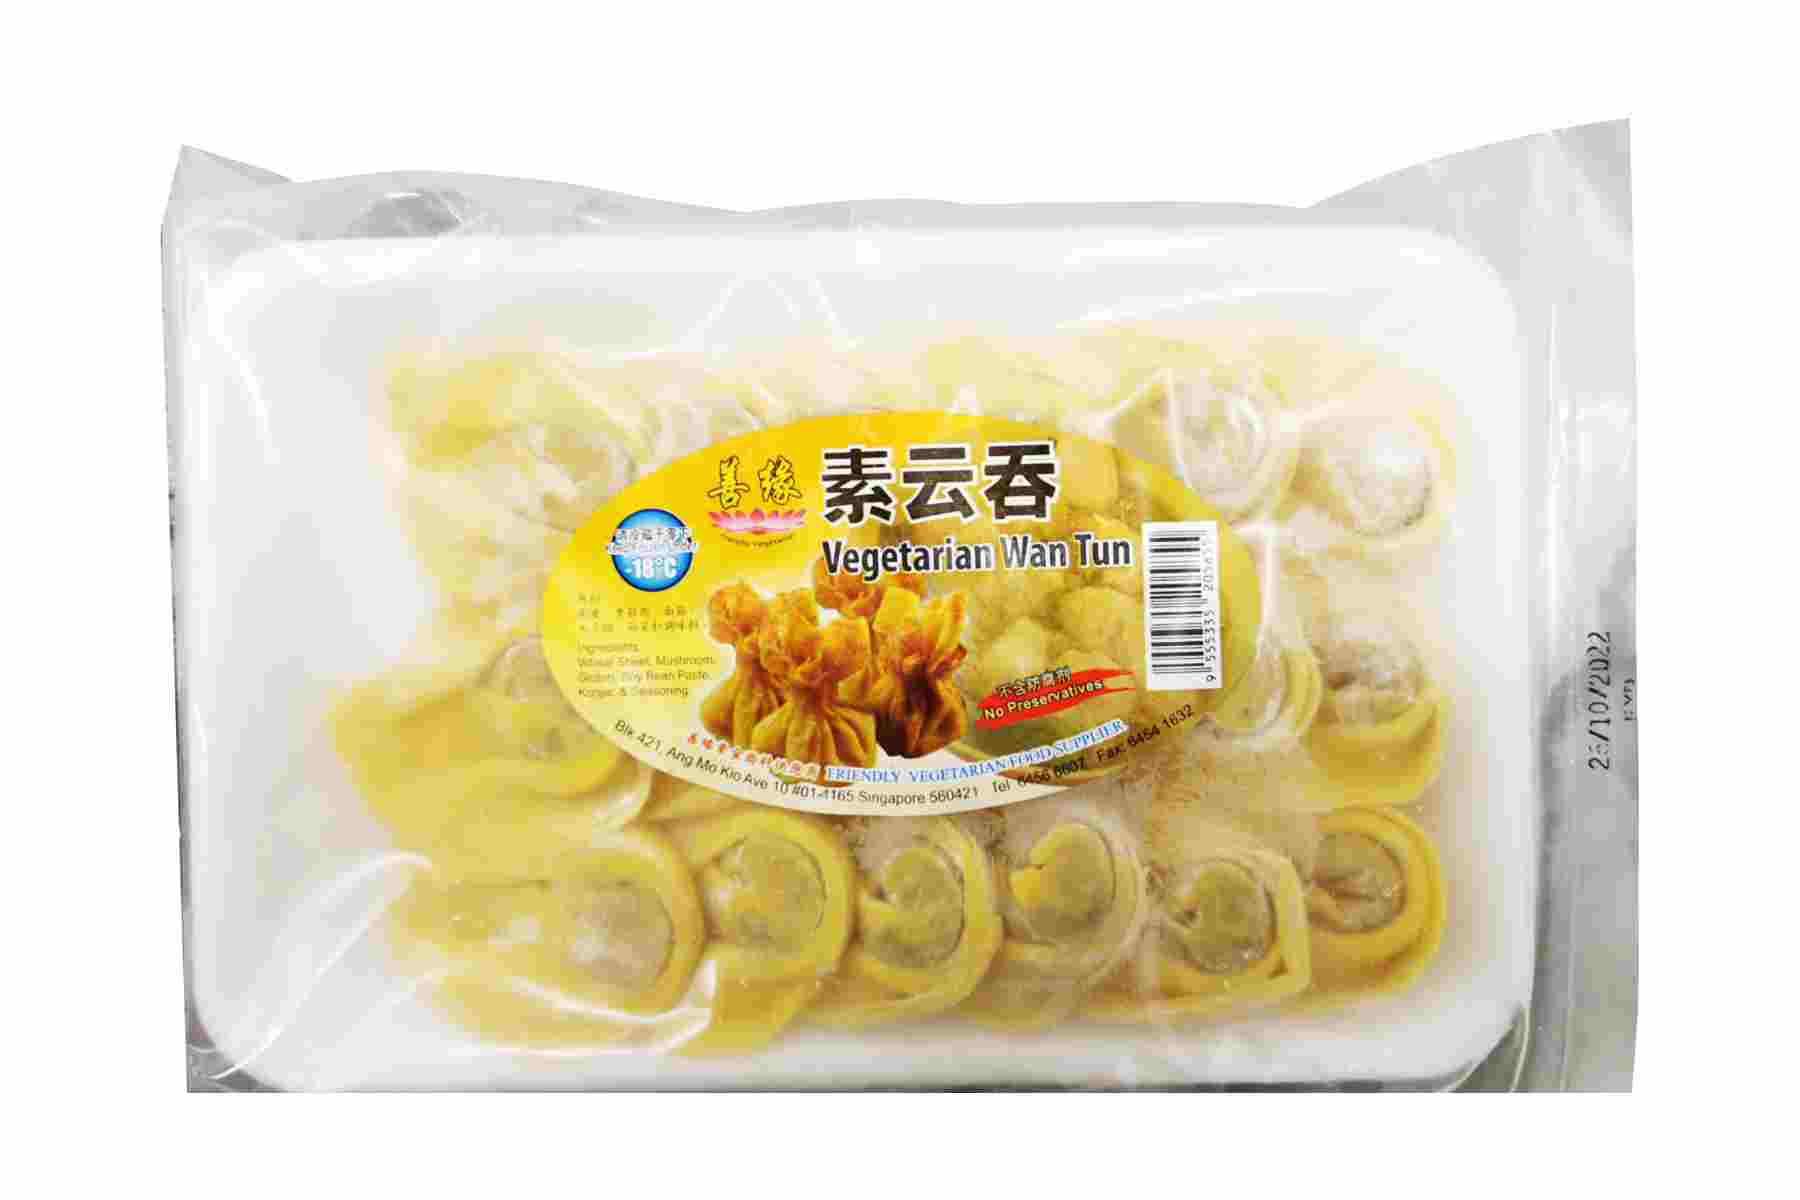 Image Vegetarian Wan Tun 善缘-云吞 200 grams